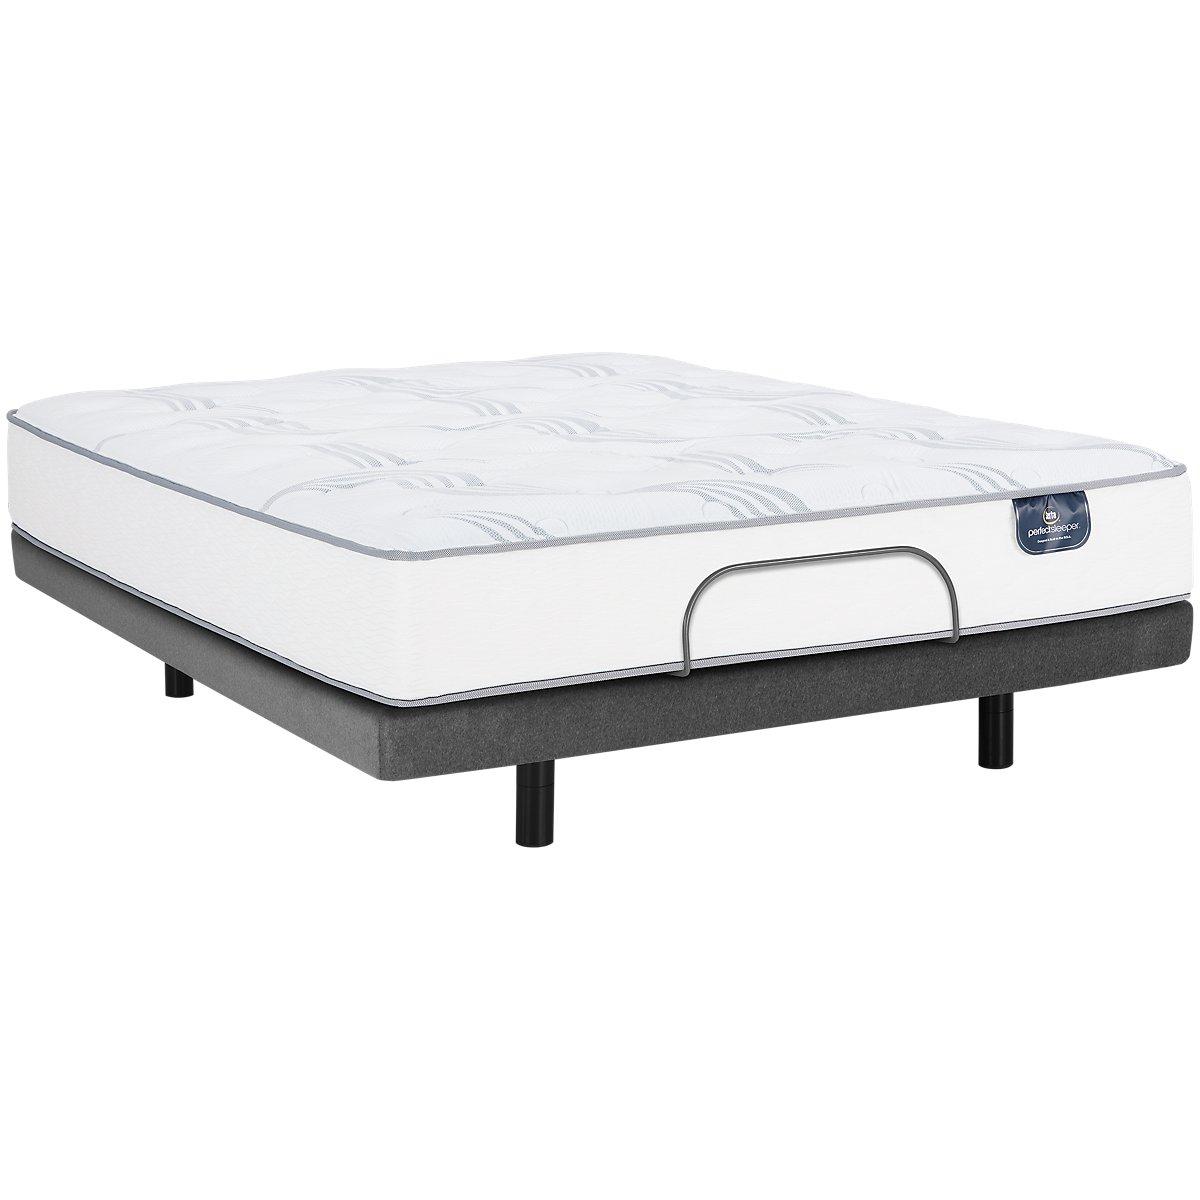 City furniture serta perfect sleeper cobbins plush elite for Furniture mattress city